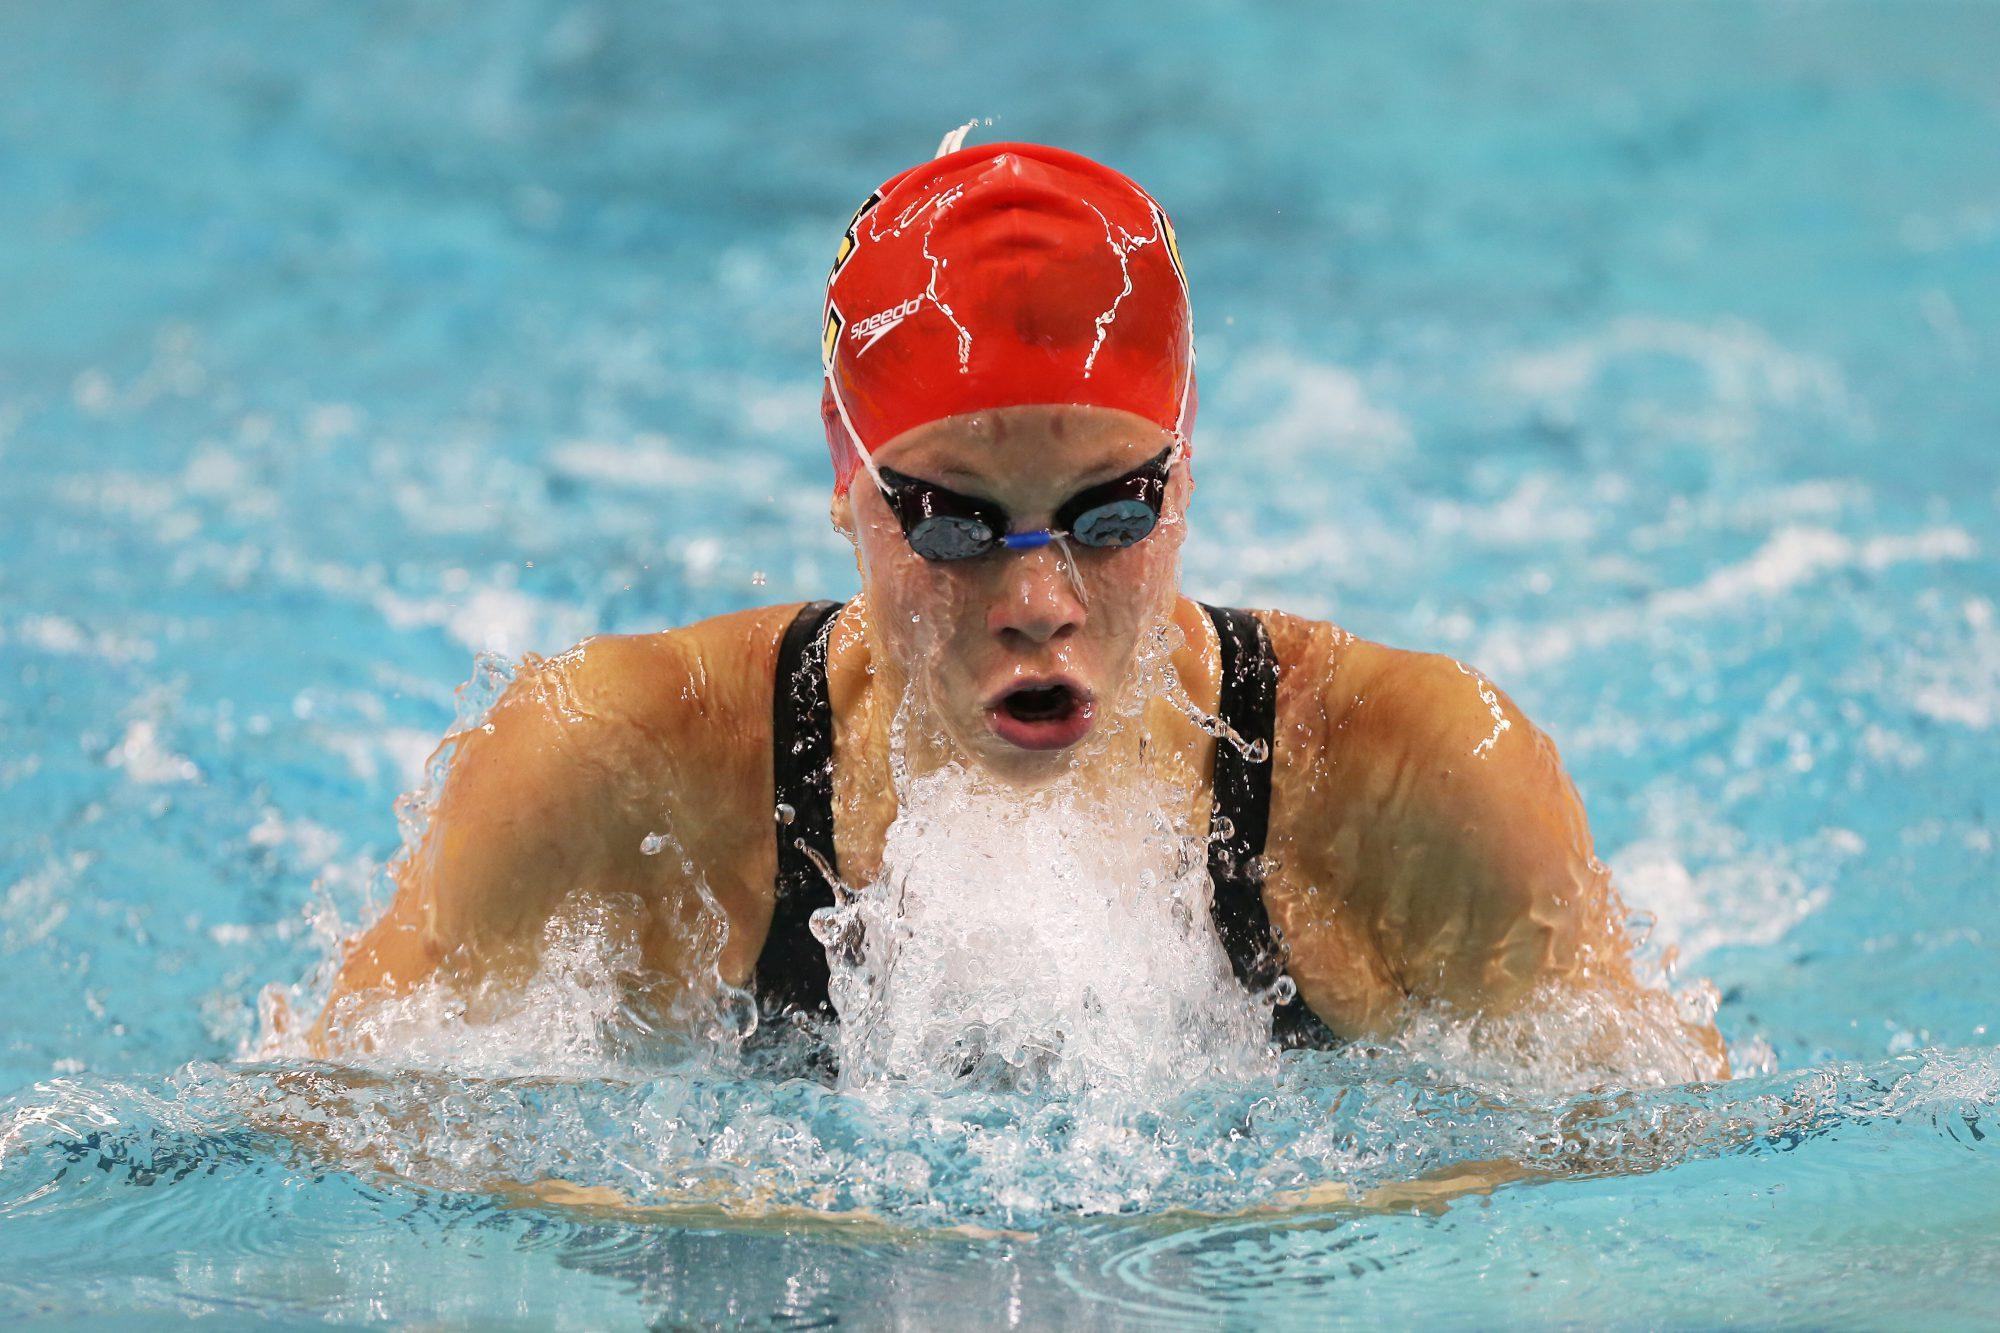 College Swim Meet, Womens 4 x 100 Freestyle Relay Race